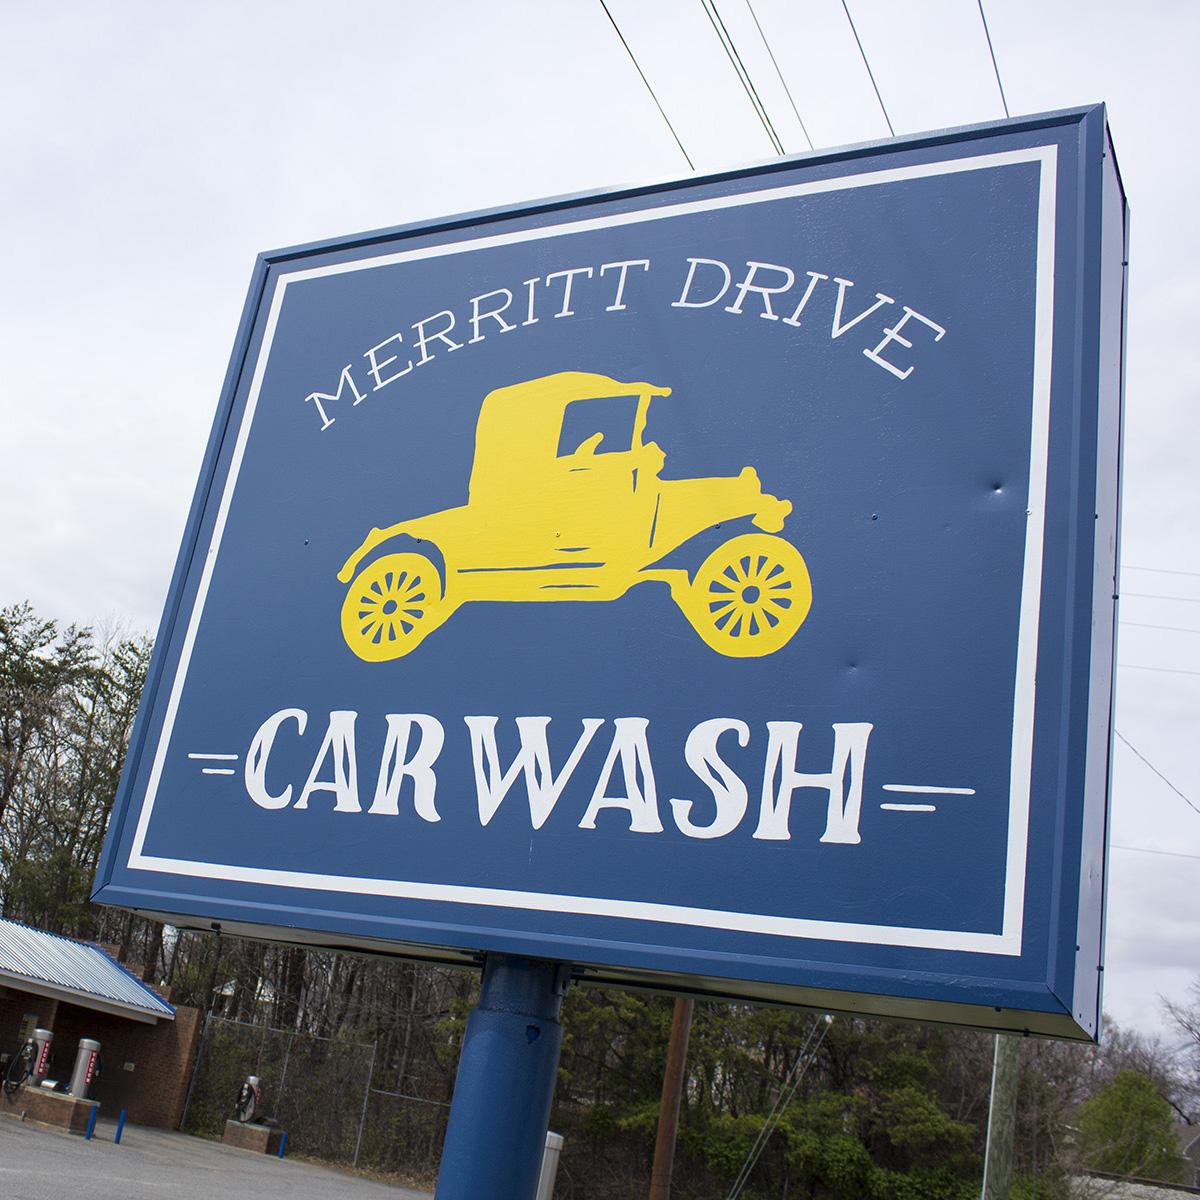 sign-painting-merritt-drive-carwash.jpg